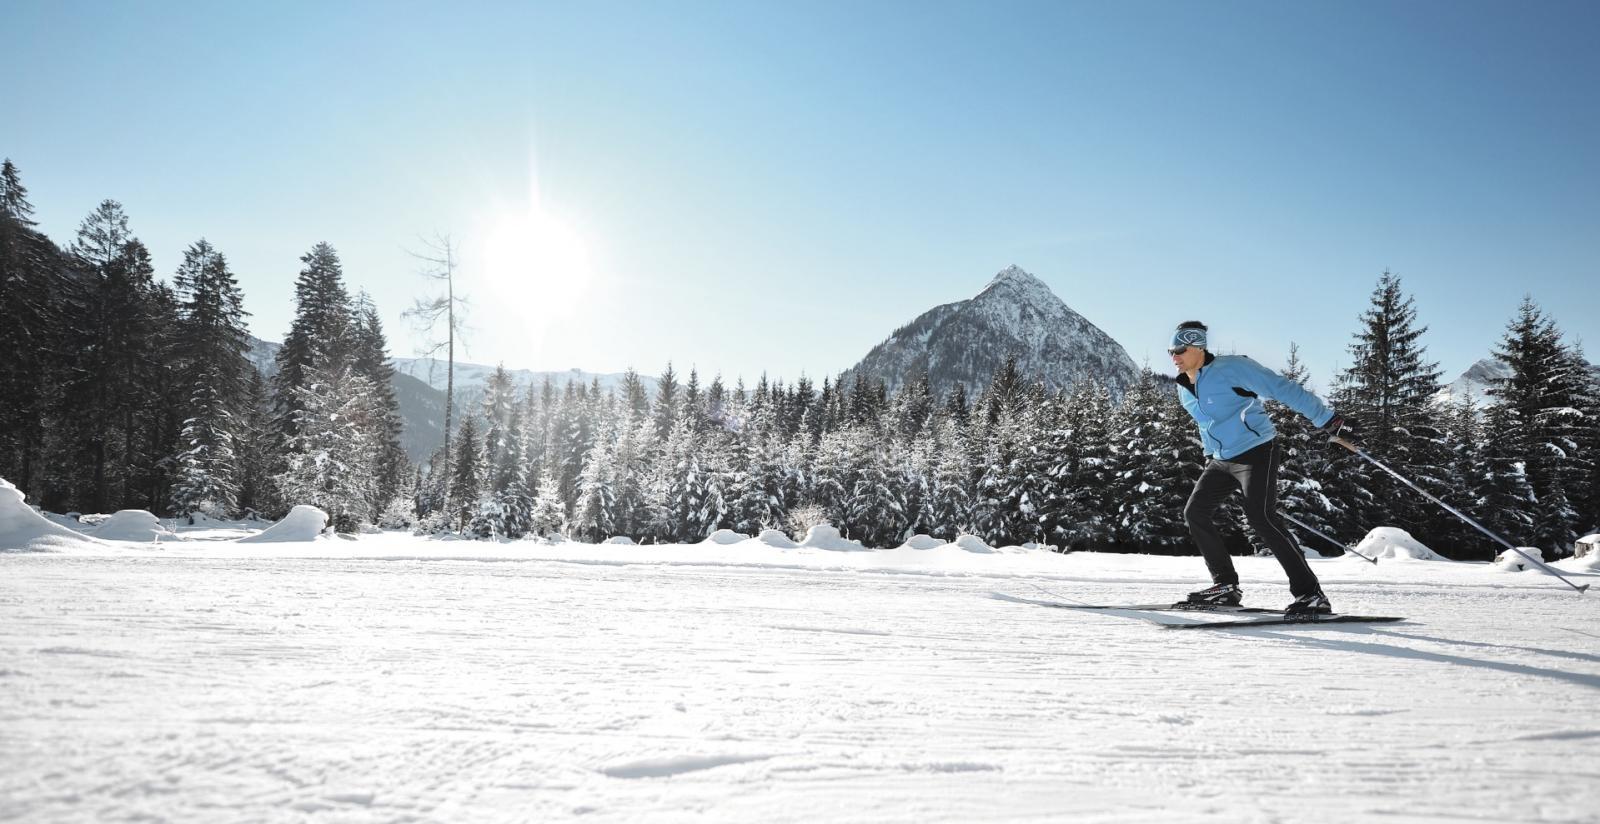 Fastenkur: Foto vom Wellnesshotel Verwöhnhotel Kristall   Wellness Tirol